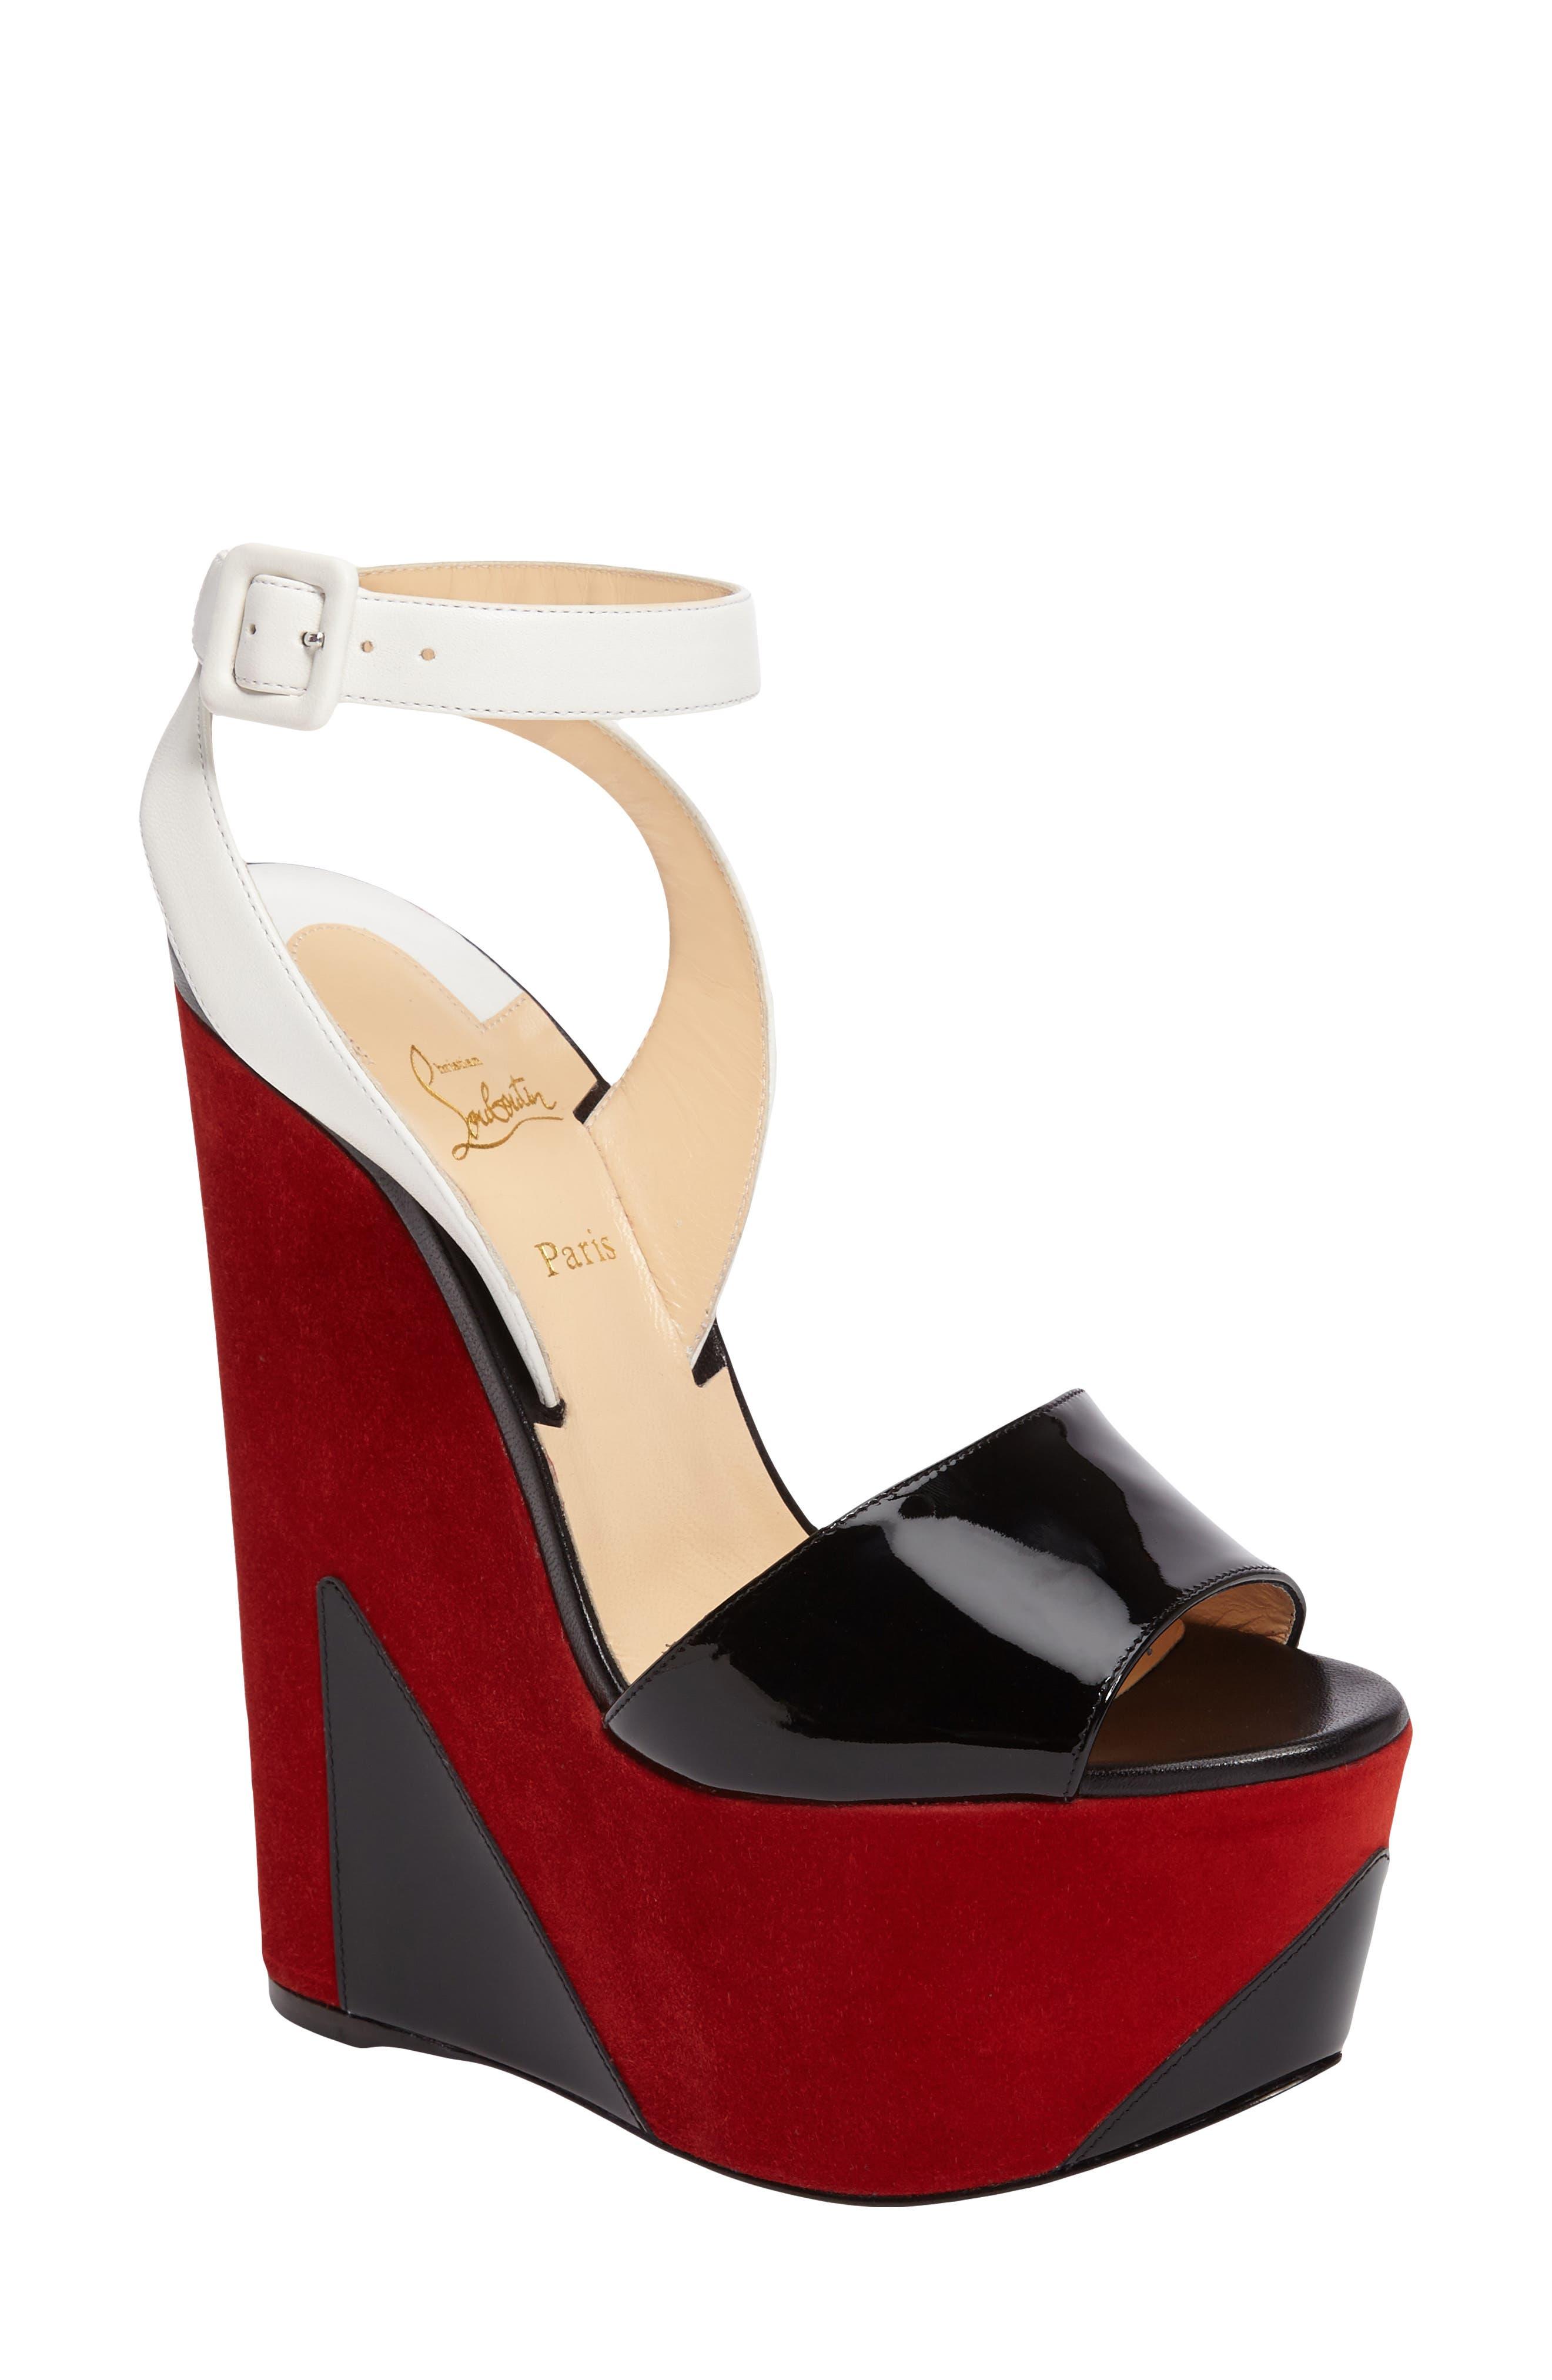 Alternate Image 1 Selected - Christian Louboutin Tromploia Platform Sandal (Women)